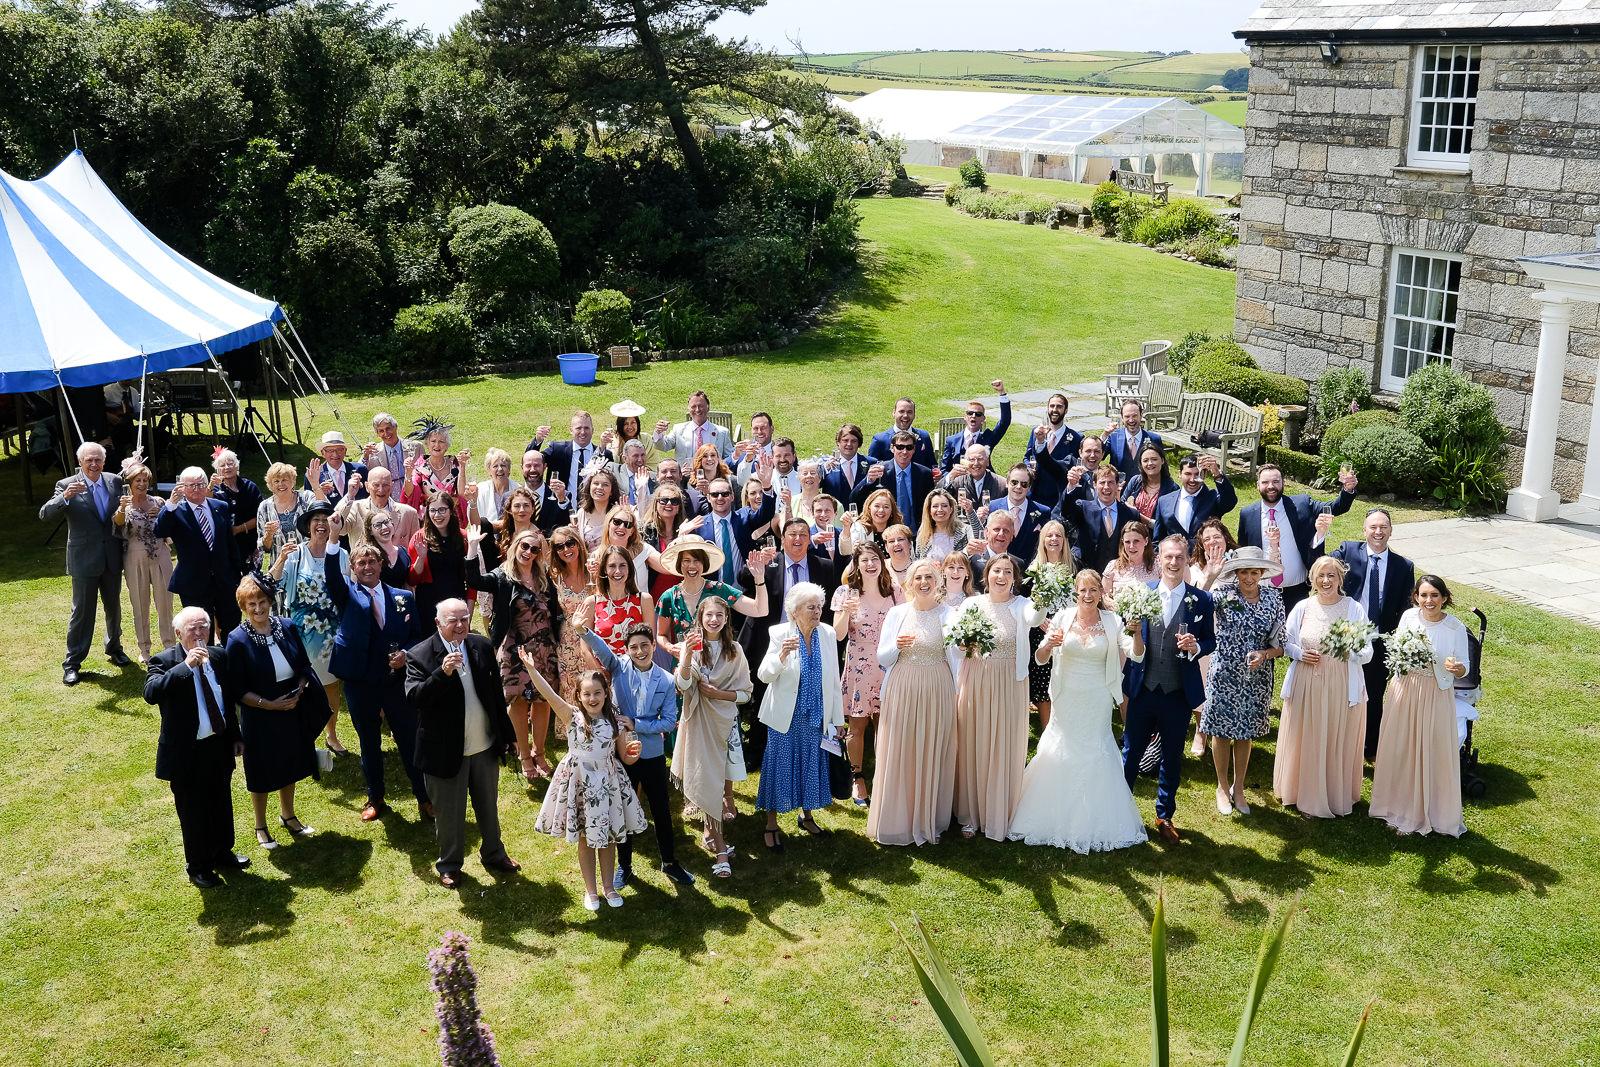 Roscarrock Farm wedding in Cornwall 046.jpg